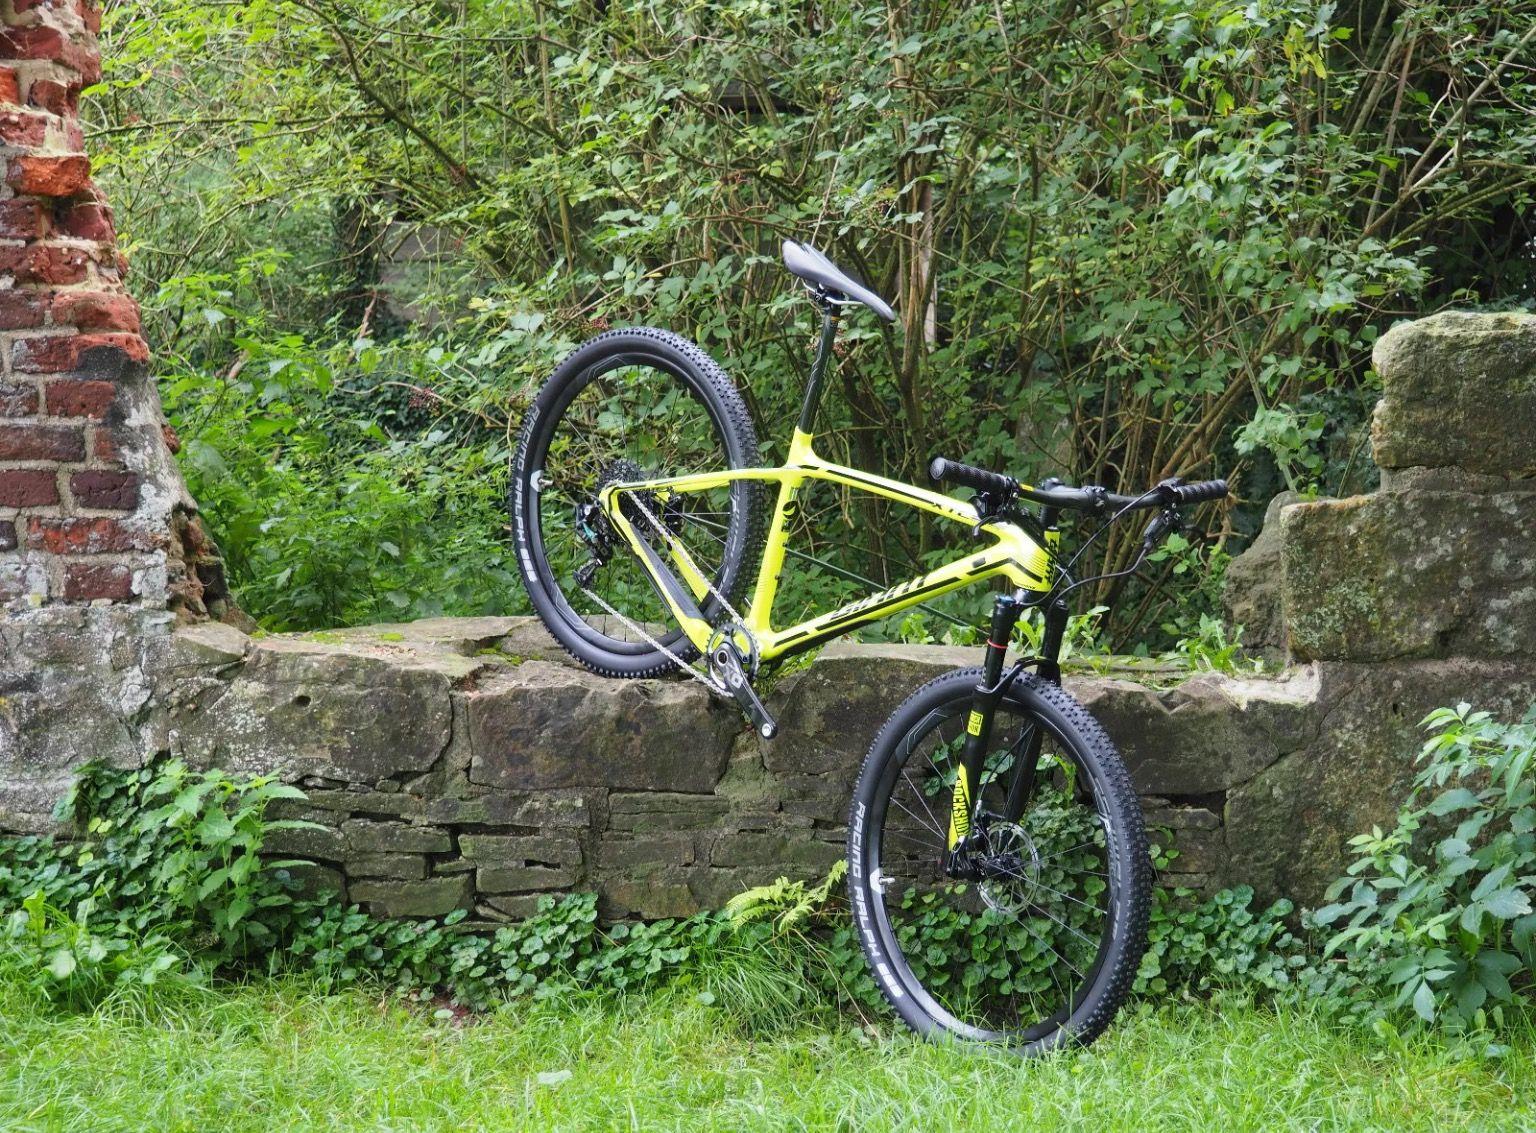 Giant XTC 27.5 Advanced SL 2016 Lime Yellow   Hobbies (Bicycle-Bikes ...